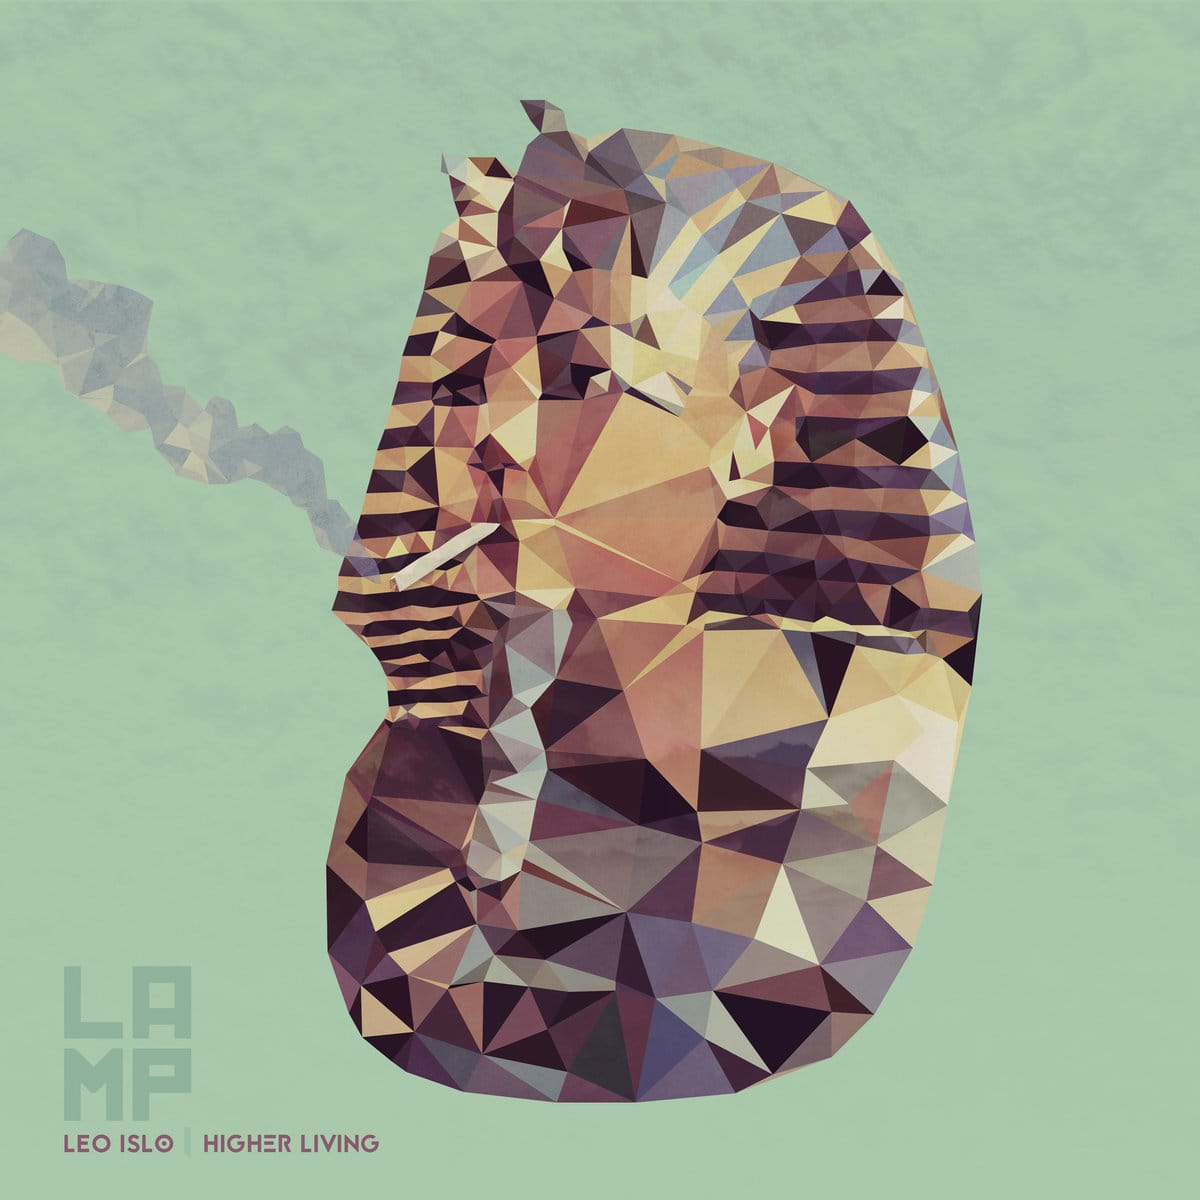 Higher Living (Instrumental)